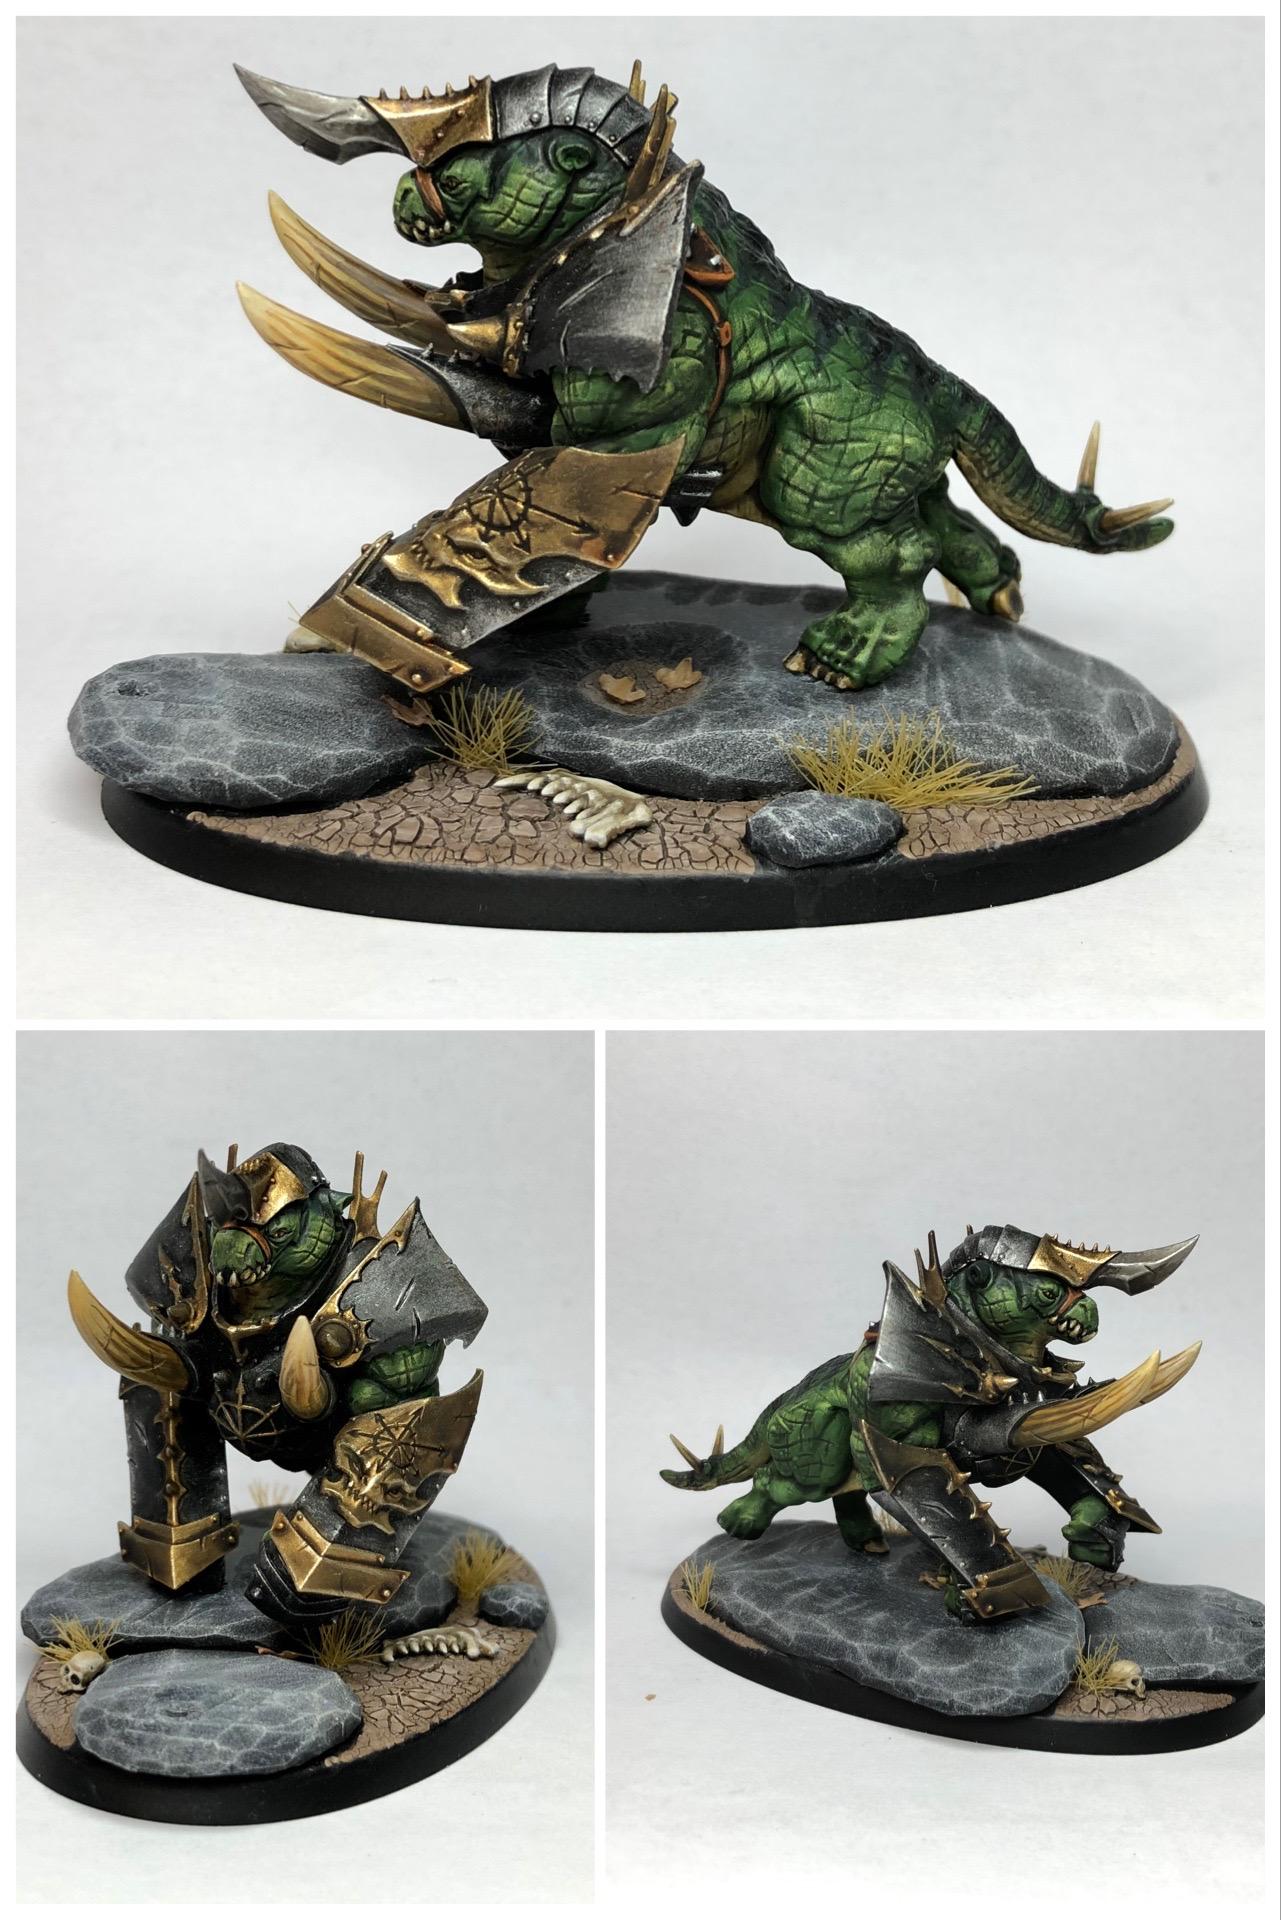 Warhammer Chaos Gorebeast Converted Daemonic Mount